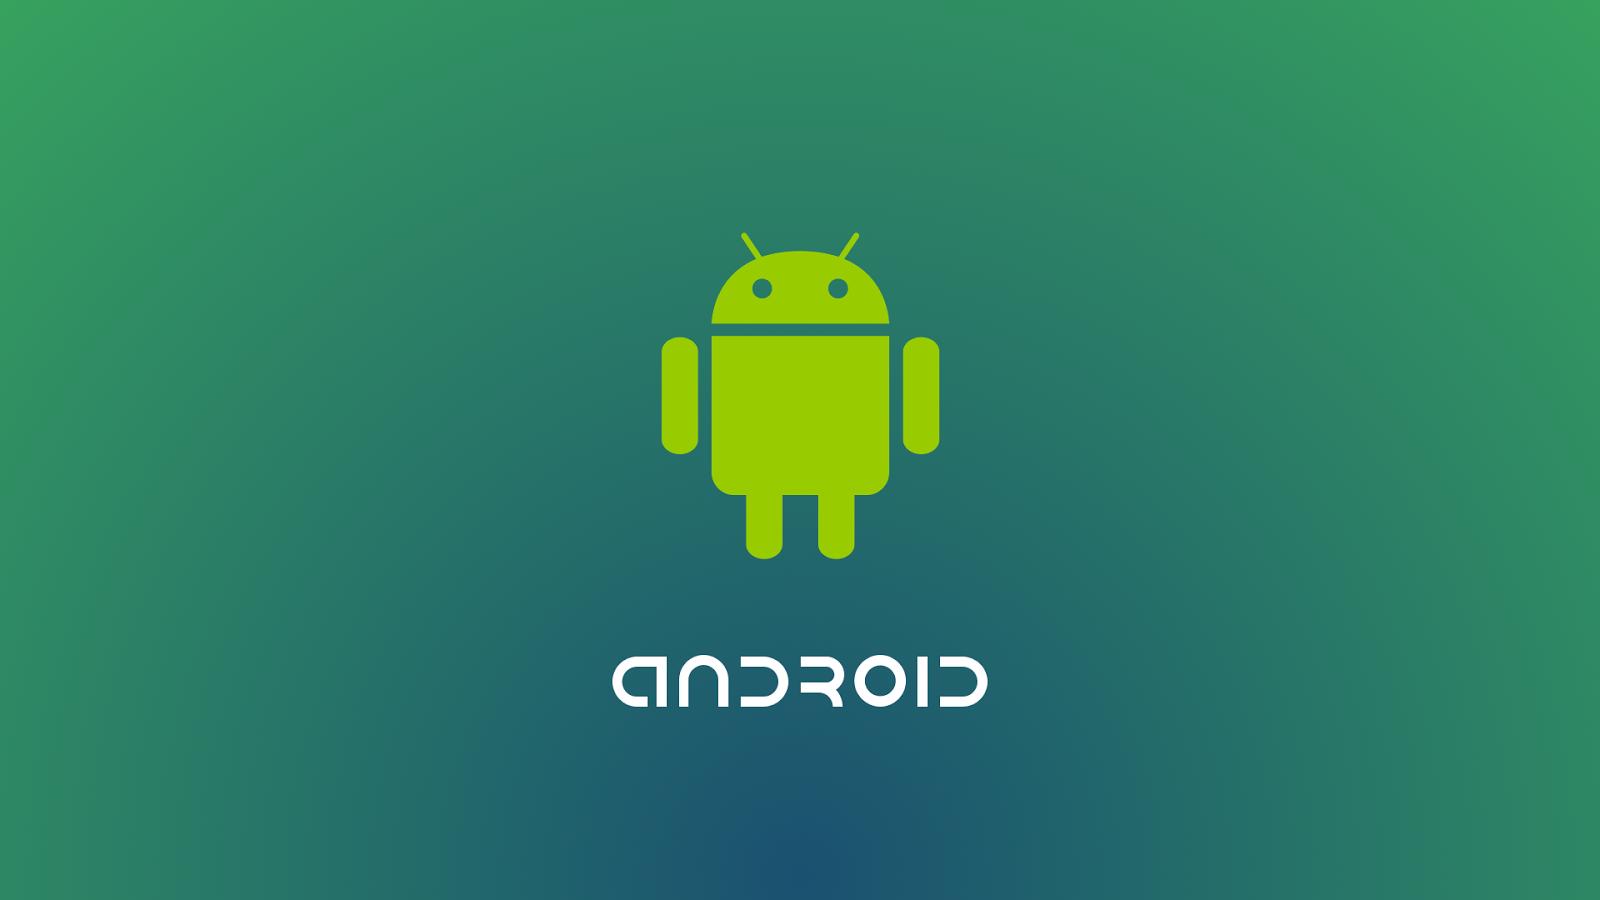 Mempercepat Perfoma Android Yang Mulai Lemot